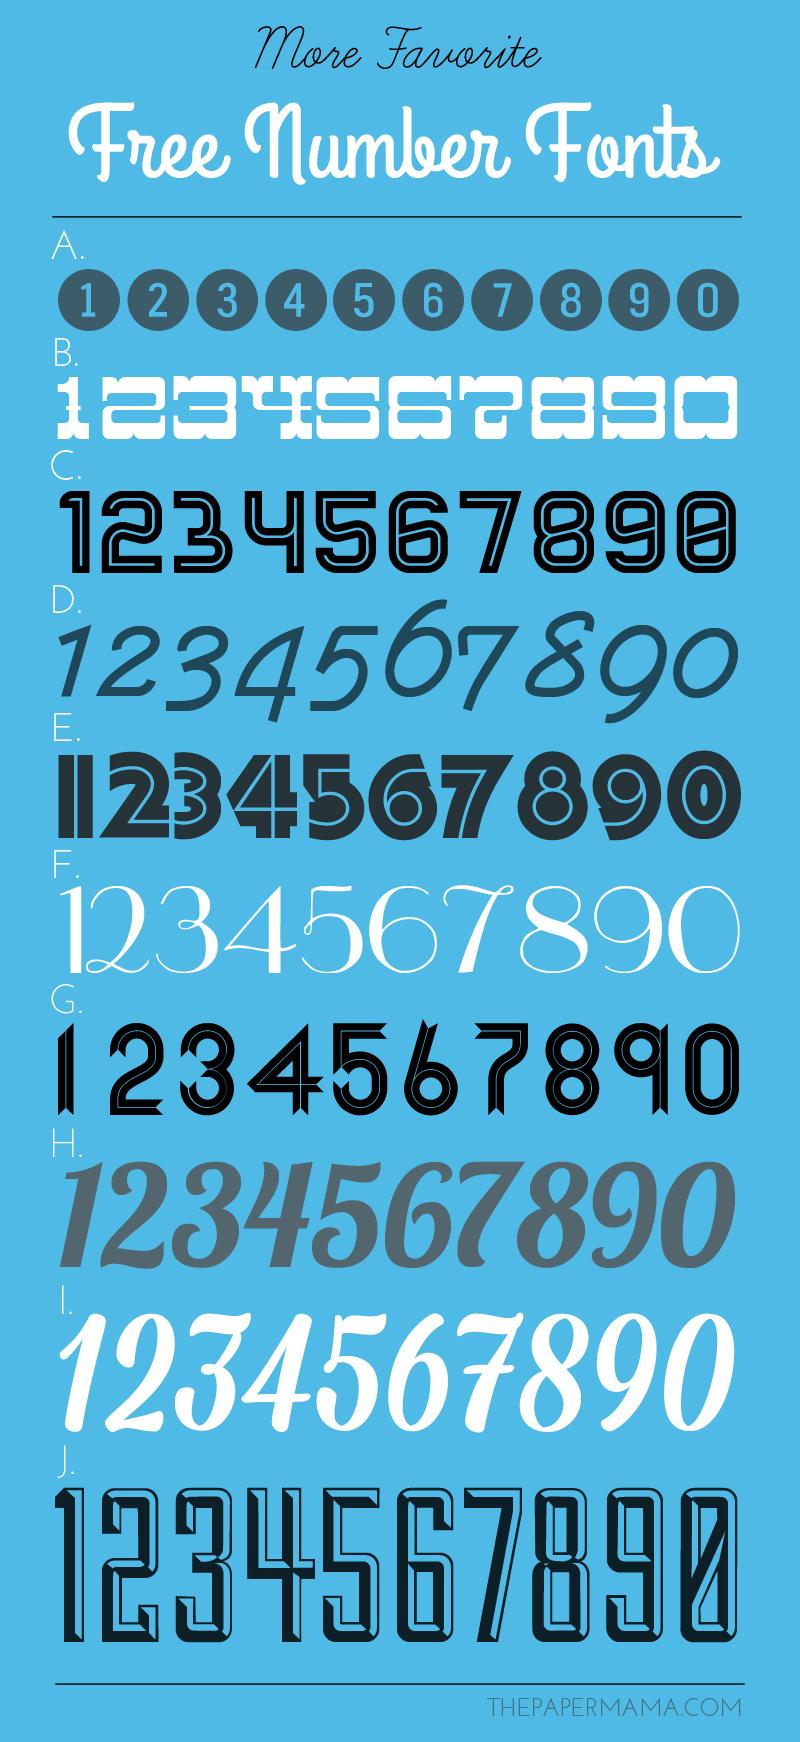 more favorite free number fonts